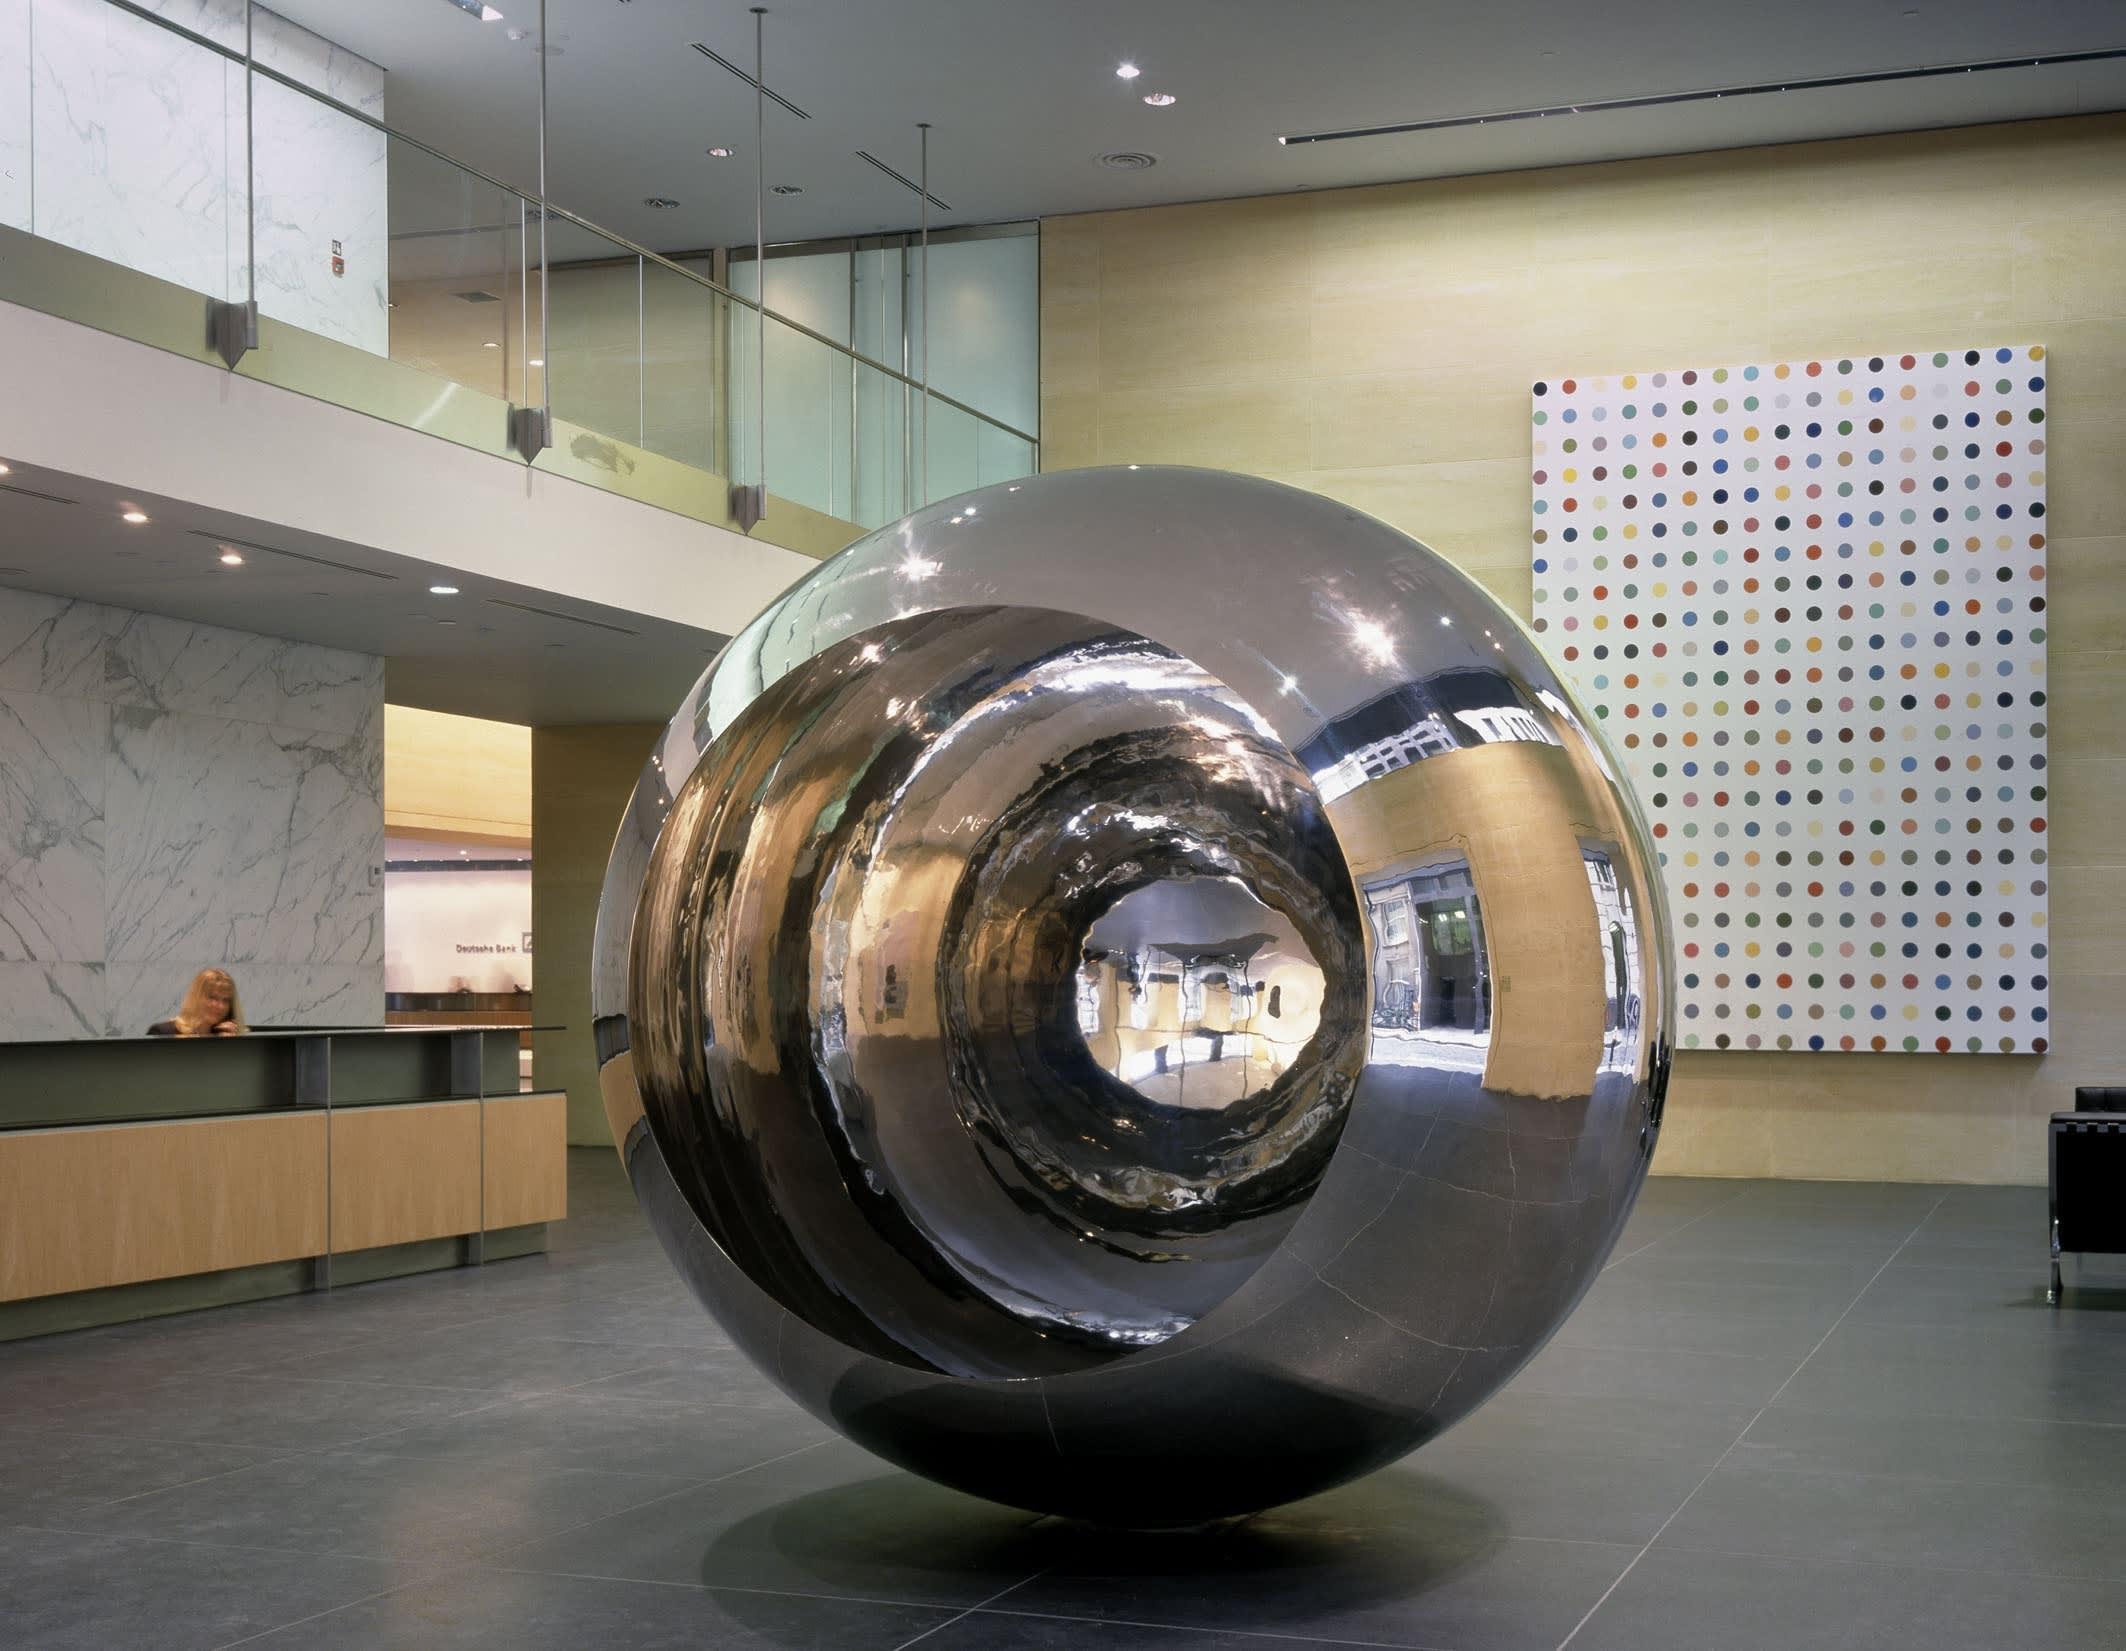 Deutsche Bank – Damien Hirst and Anish Kapoor